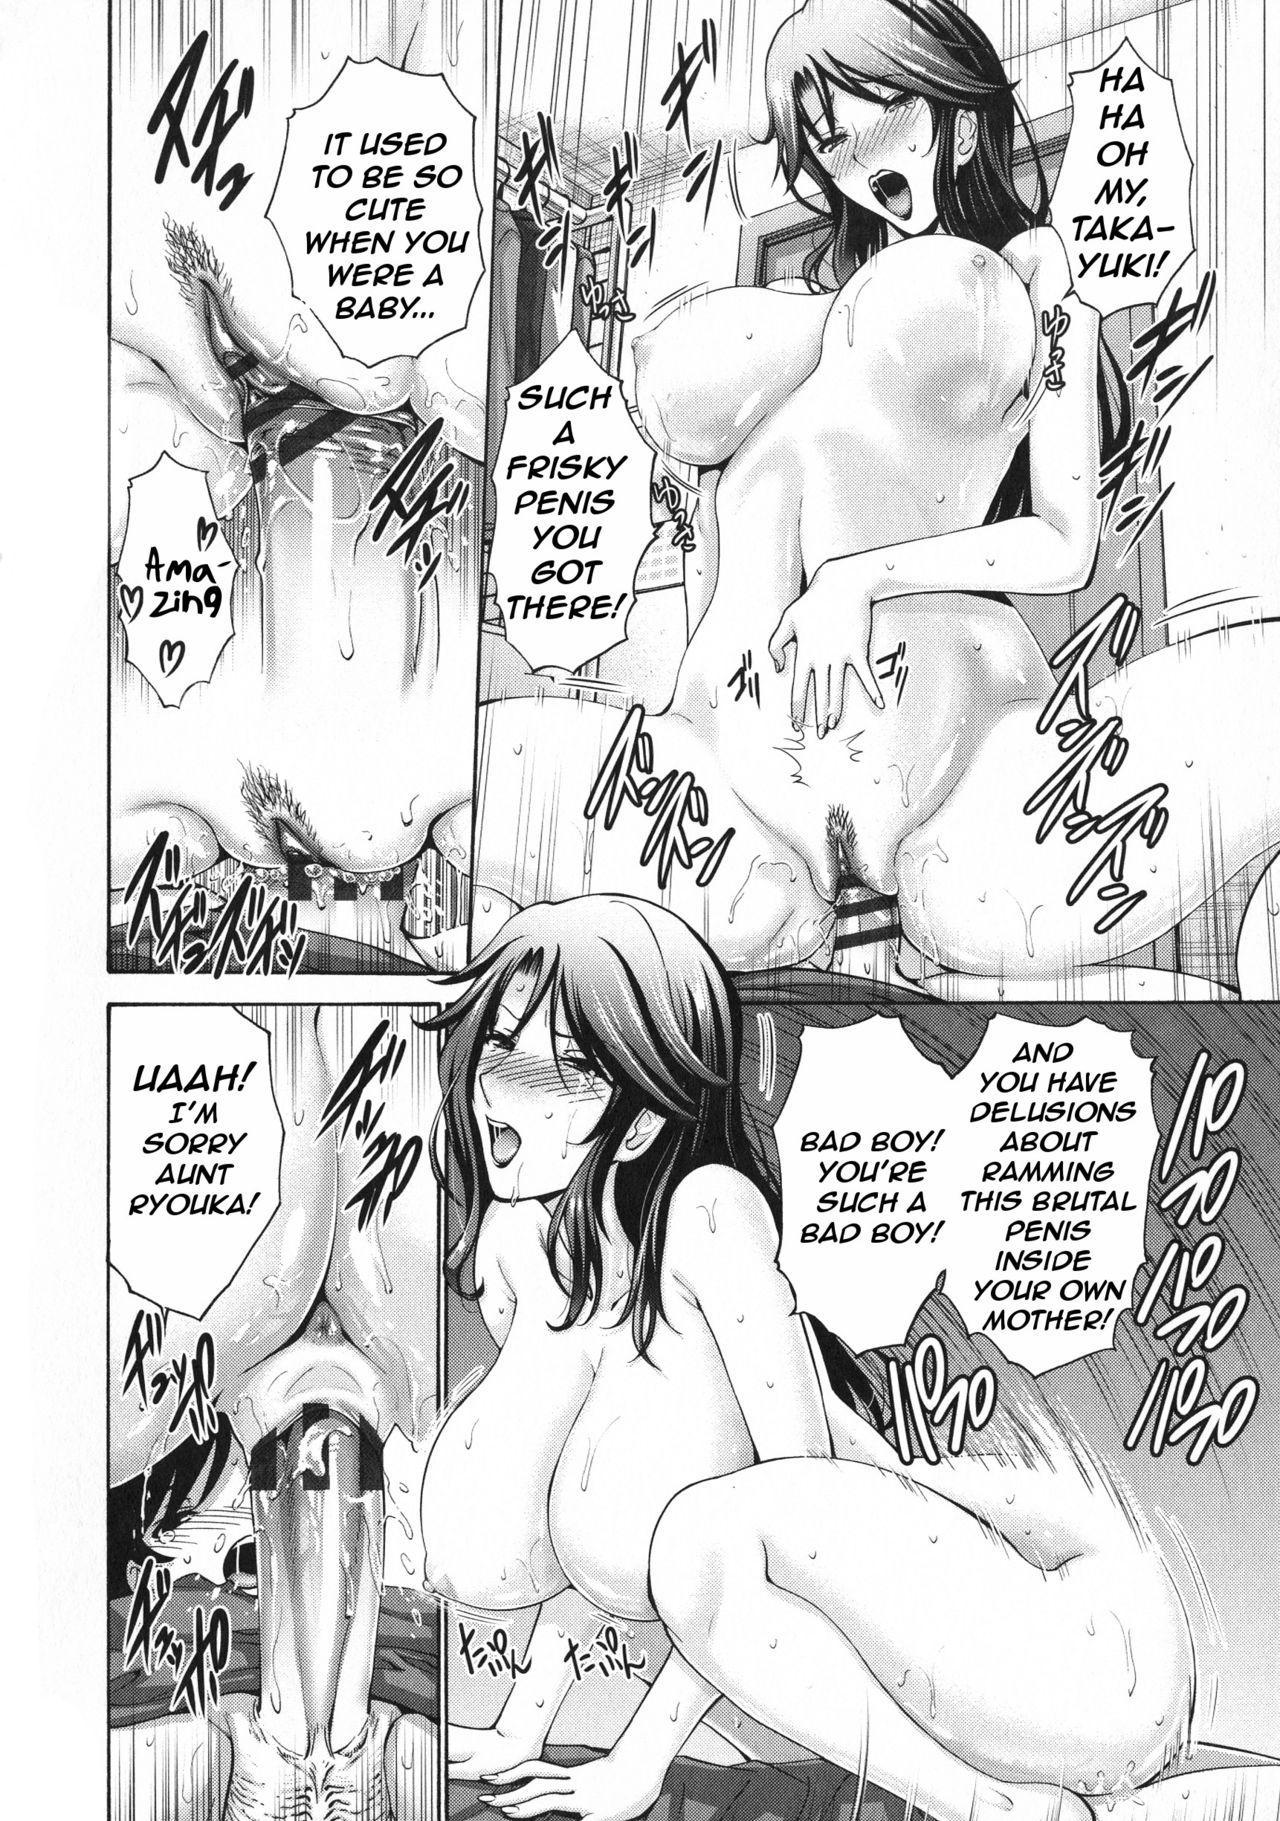 Oba Shiru Haha Shiru | Aunt's Juice Mother's Juice 9